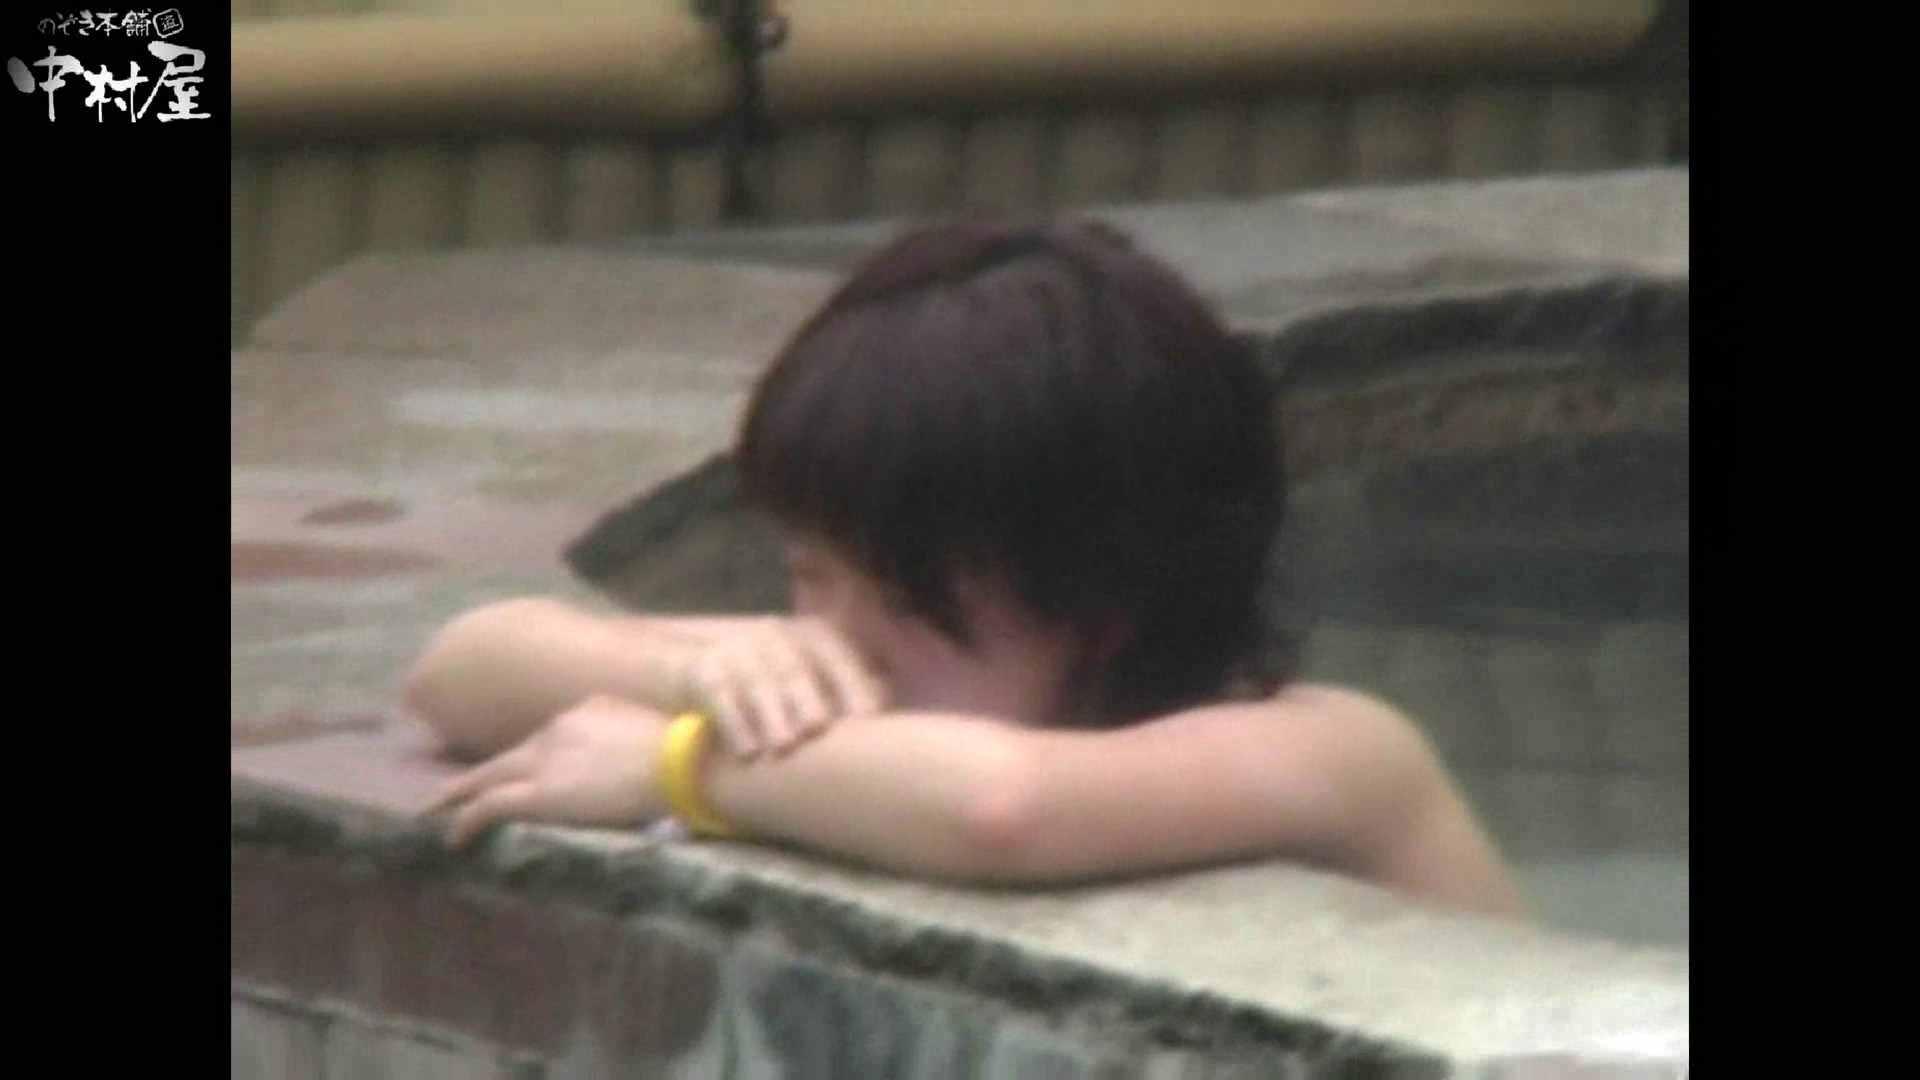 Aquaな露天風呂Vol.876潜入盗撮露天風呂十二判湯 其の五 潜入 | OLのエロ生活  112連発 85